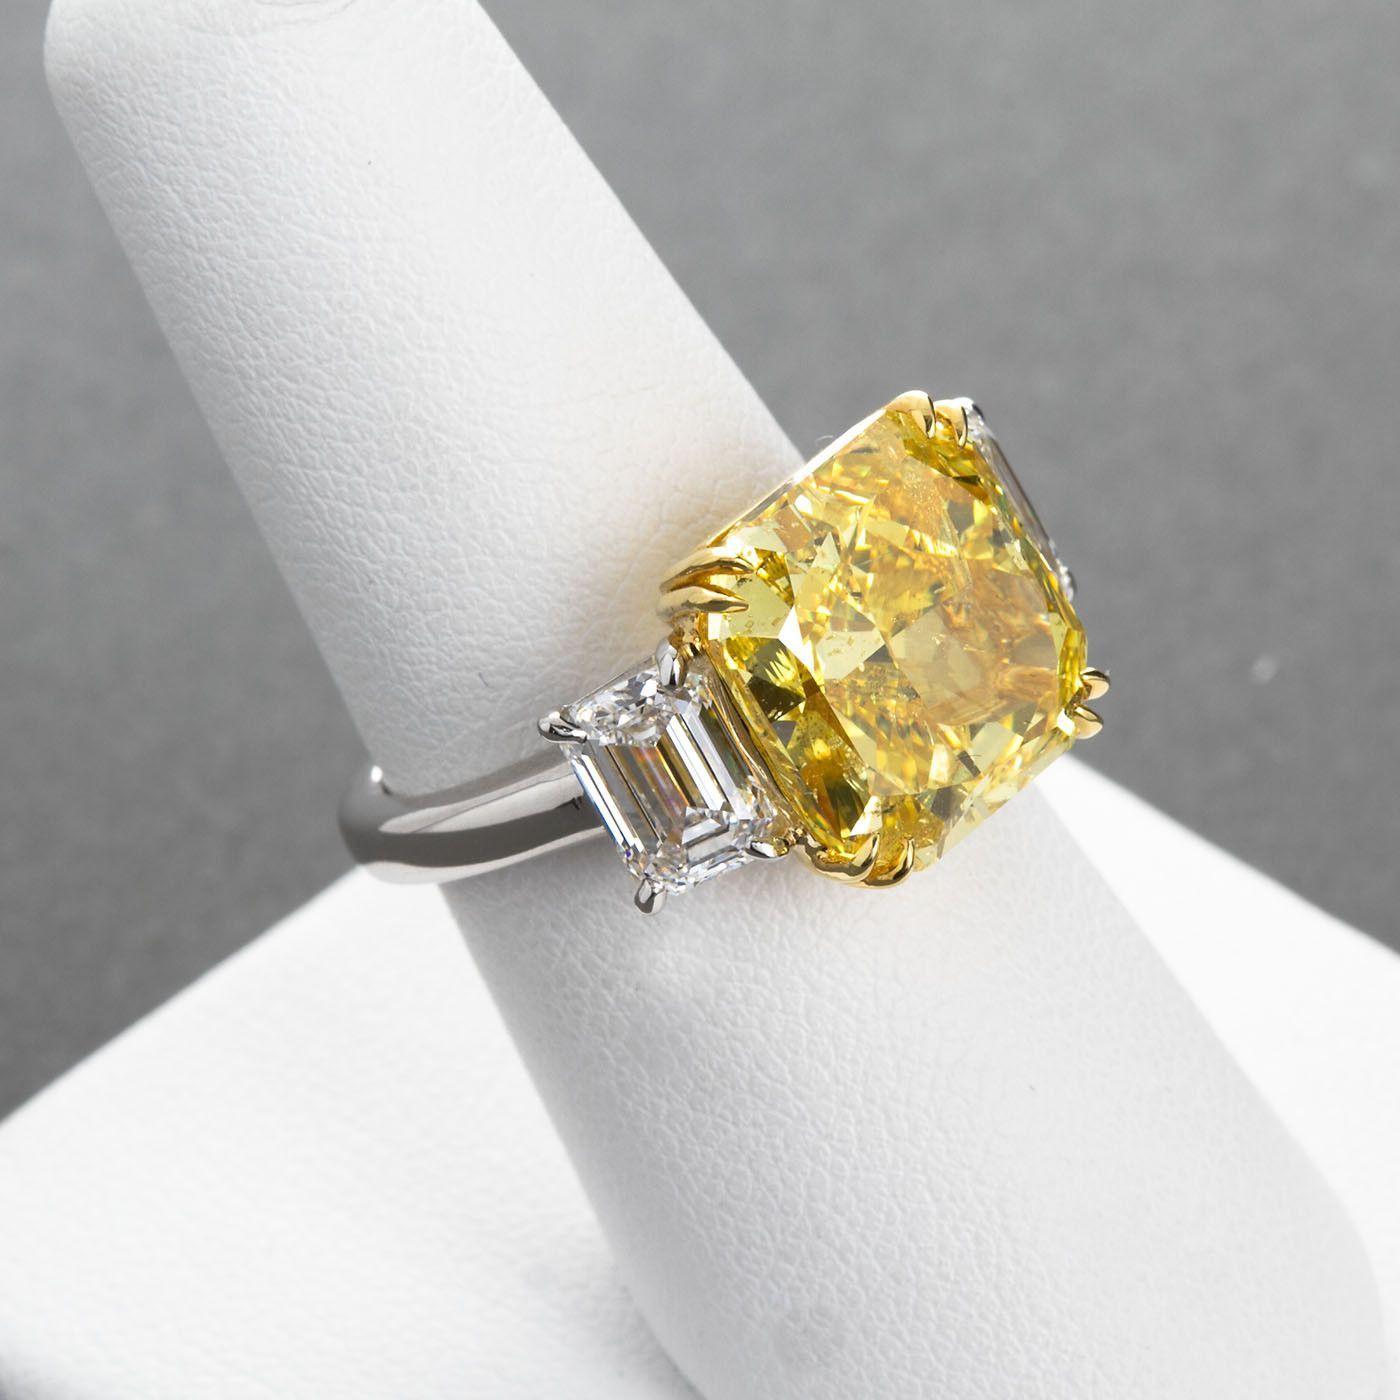 carat fancy vivid yellow radiant cut diamond engagement ring